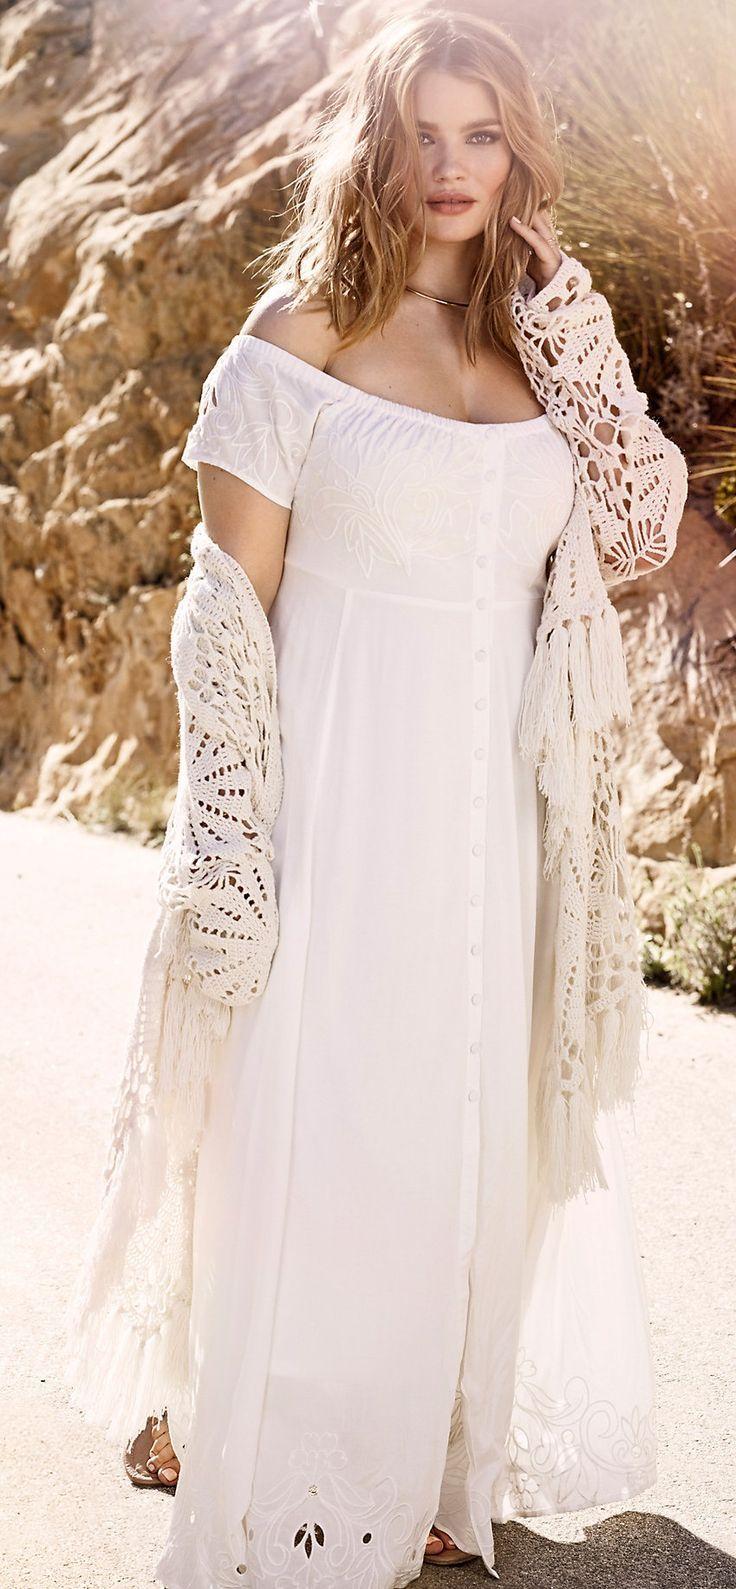 Plus Size Off The Shoulder Dress Big Size Fashion Http Amzn To 2krzpiy White Plus Size Dresses Plus Size Fashion Fashion